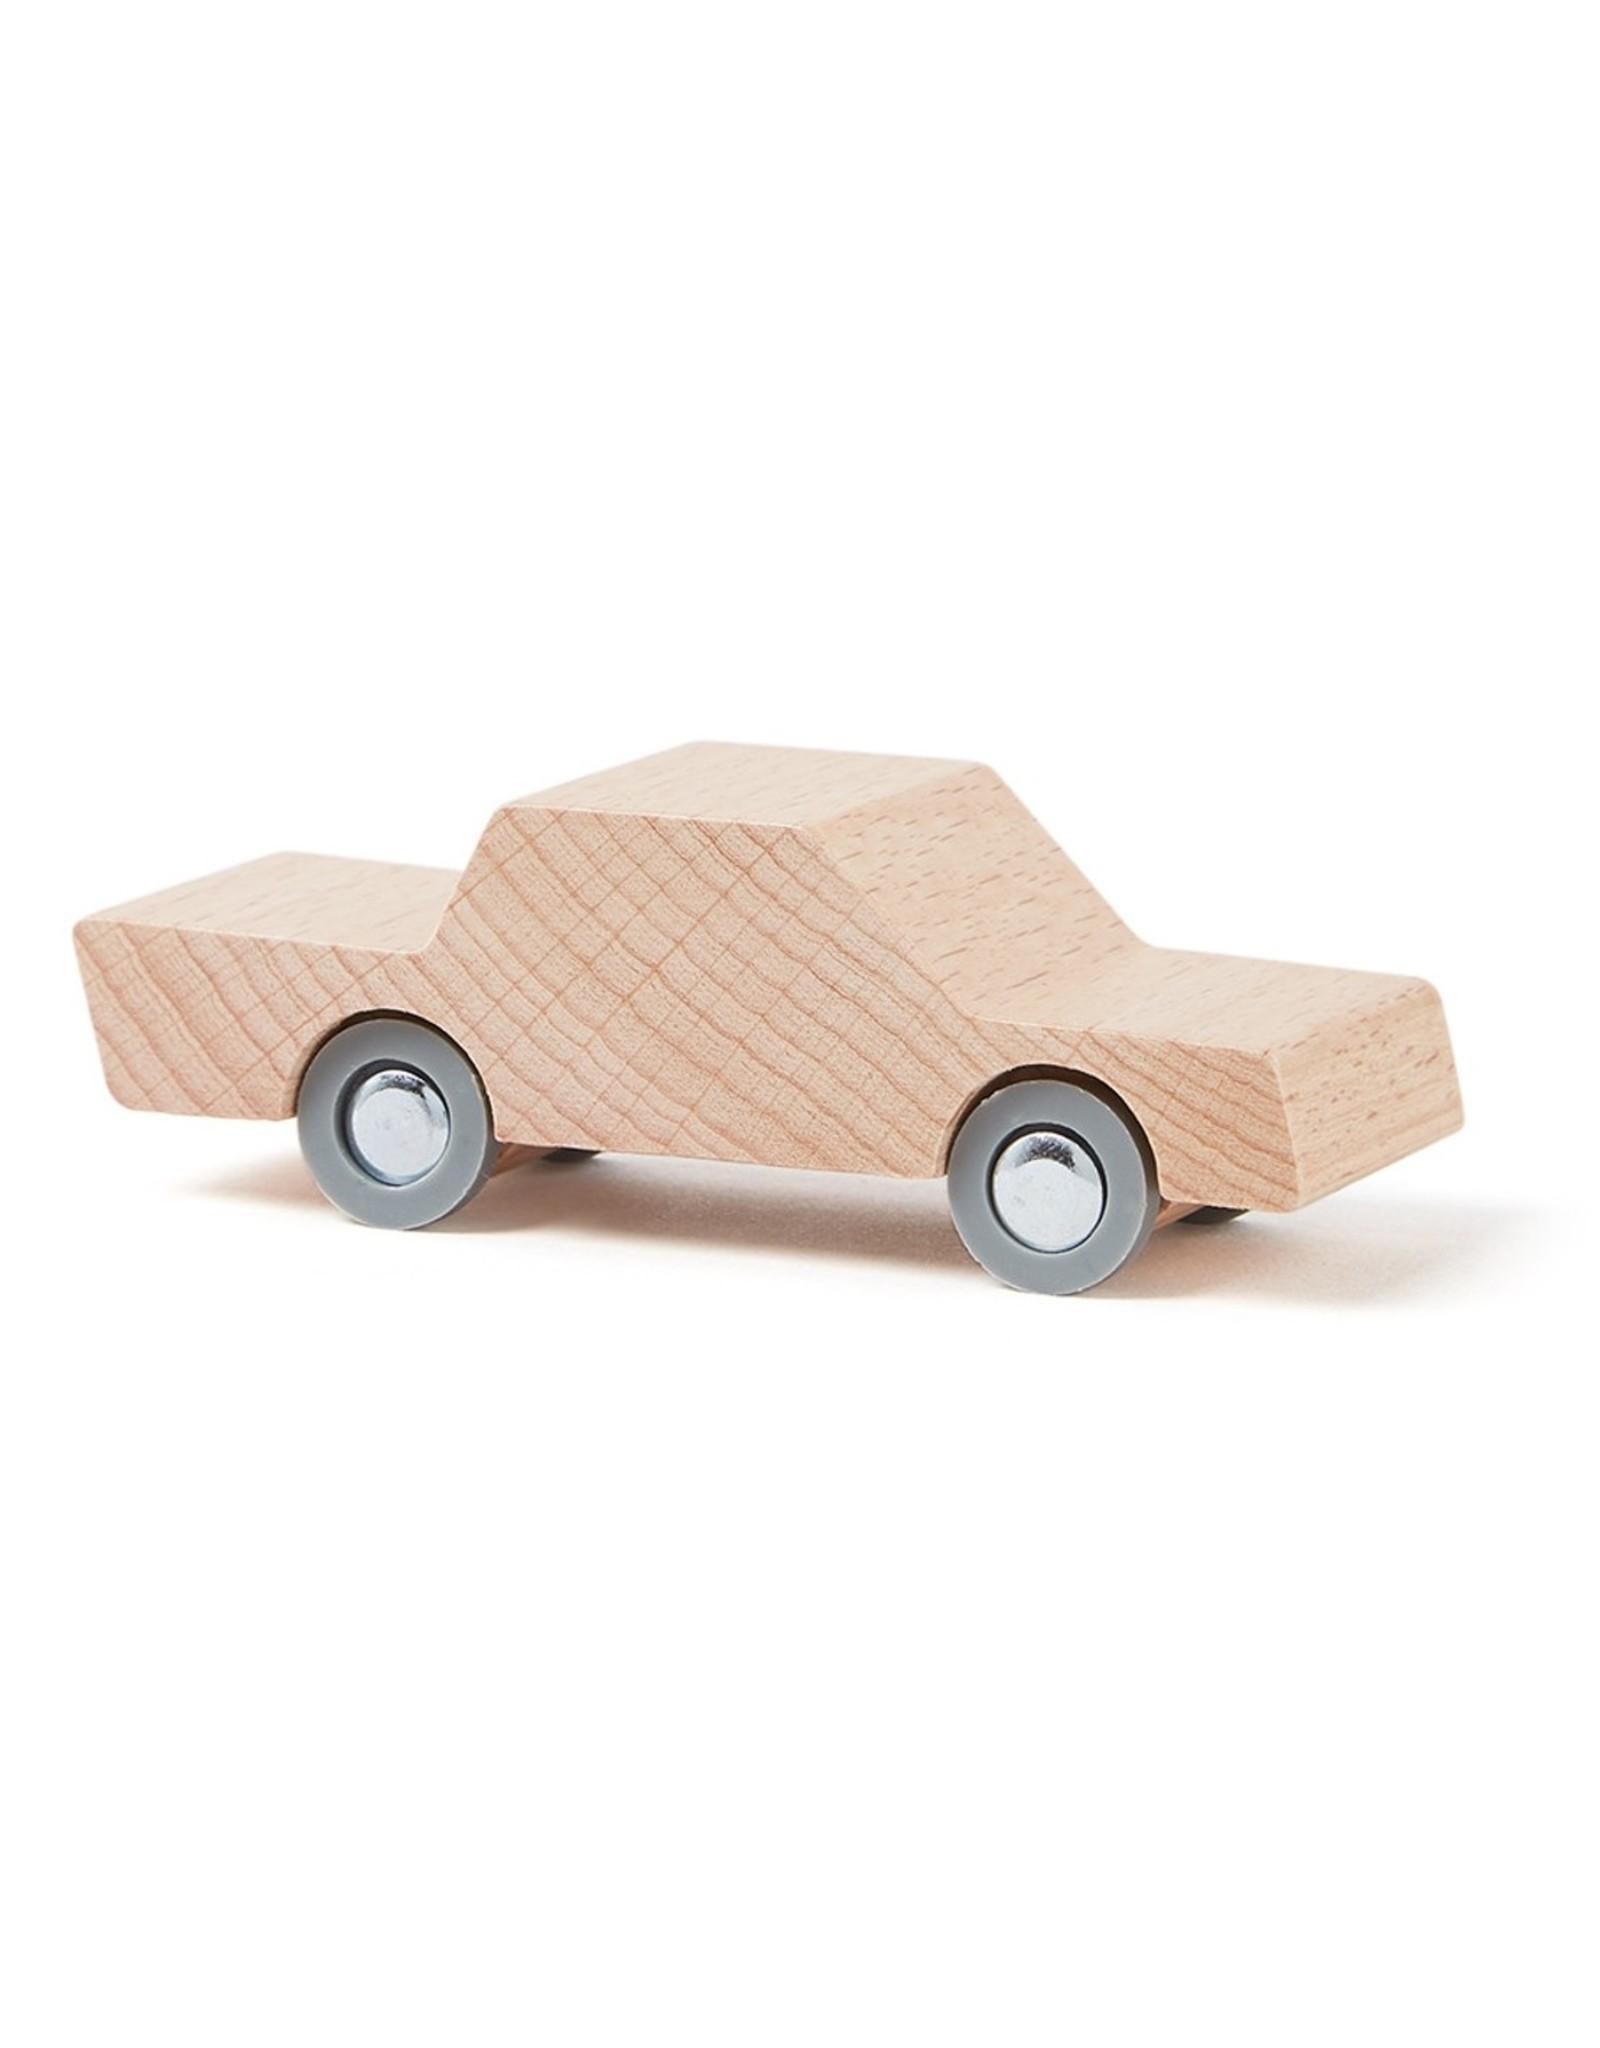 WAYTOPLAY Waytoplay - Heen en weer auto